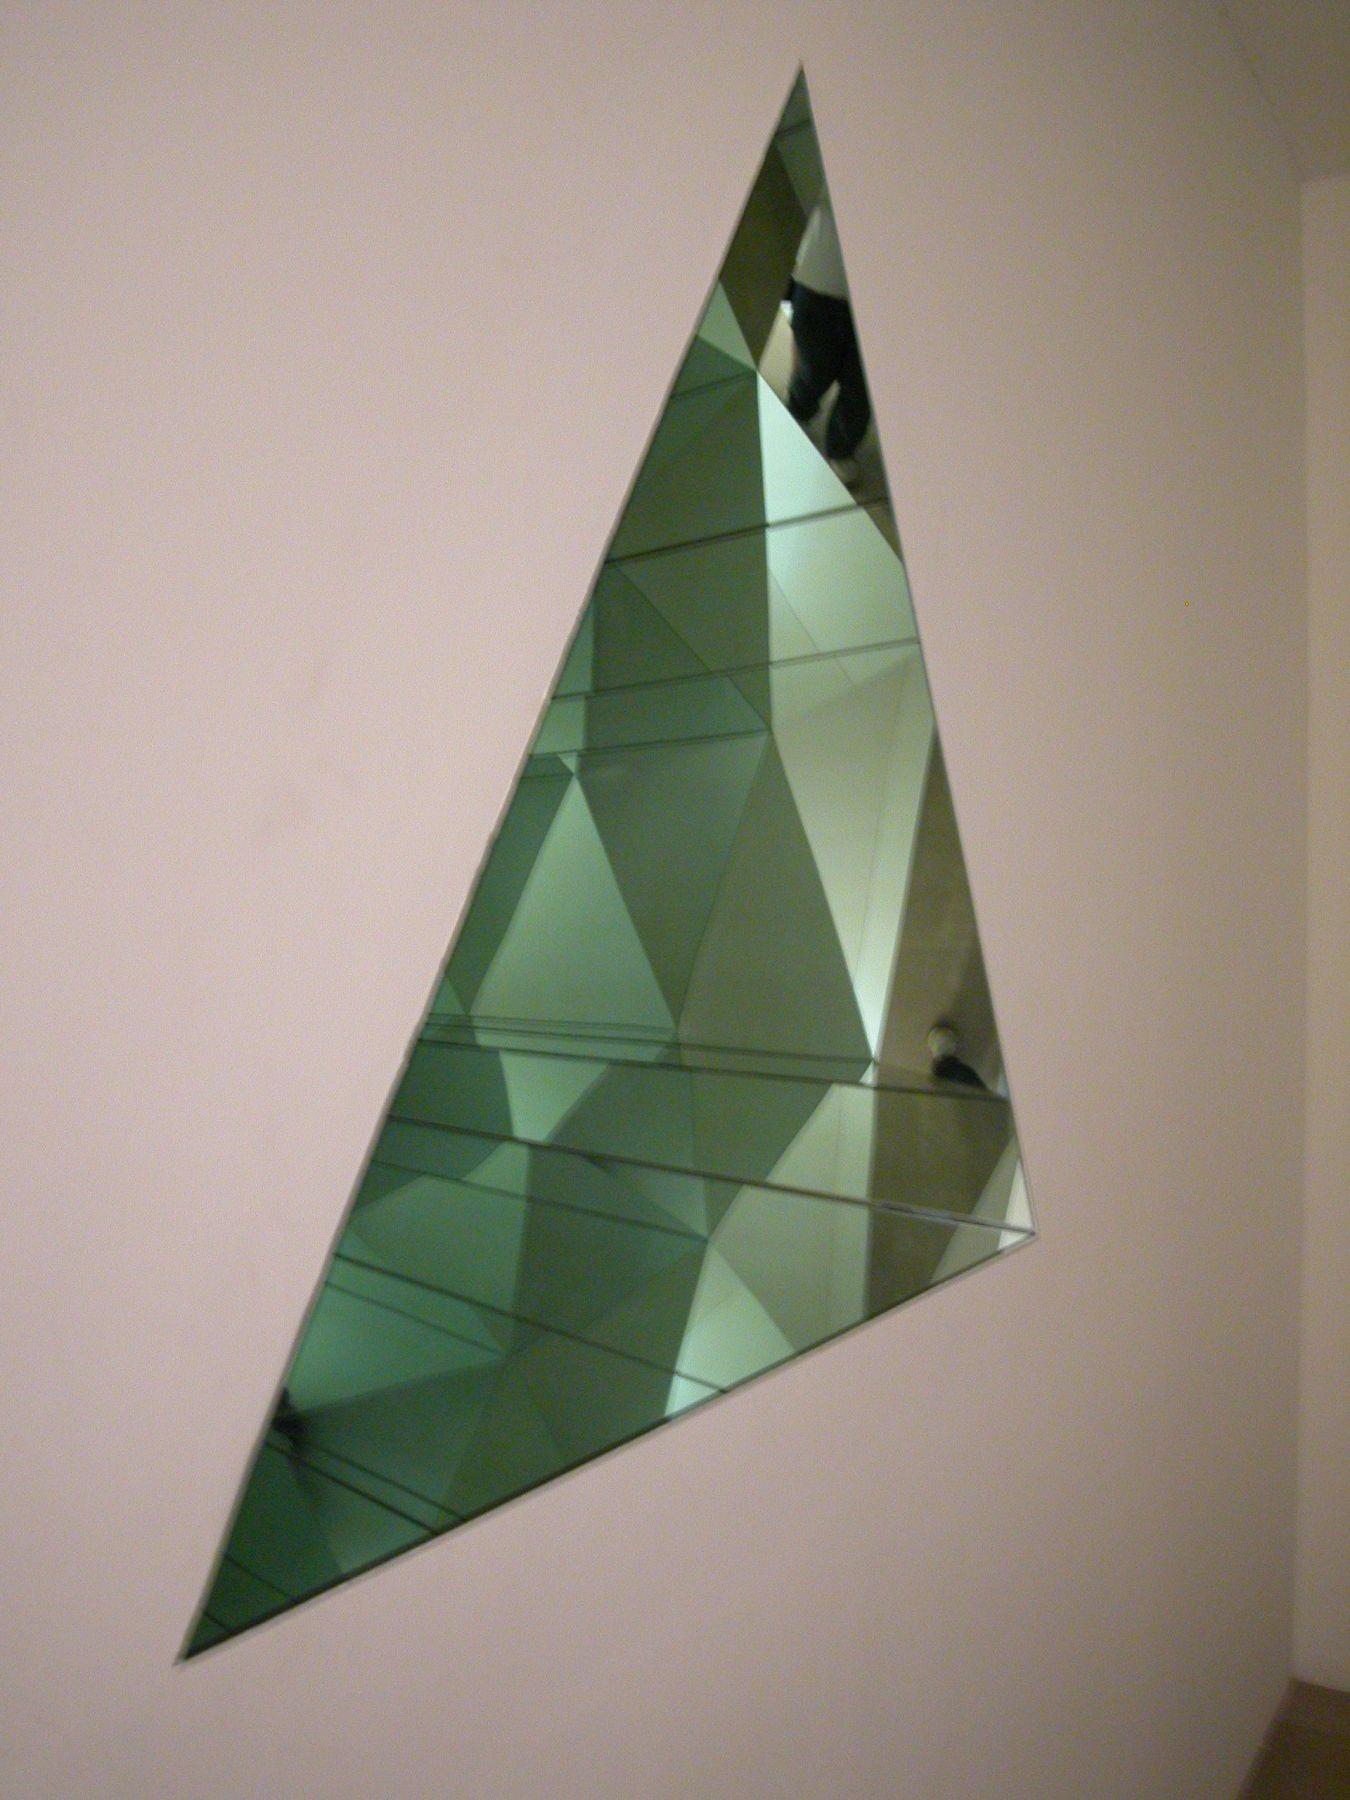 Jim Drain & Ara Peterson,  Untitled (Kaleidoscope), 2003,  mixed media installation,  kaleidoscope: 48 x 48 x 48 x 72 inches,  installation dimensions variable  Installation view, Greene Naftali, New York, 2003